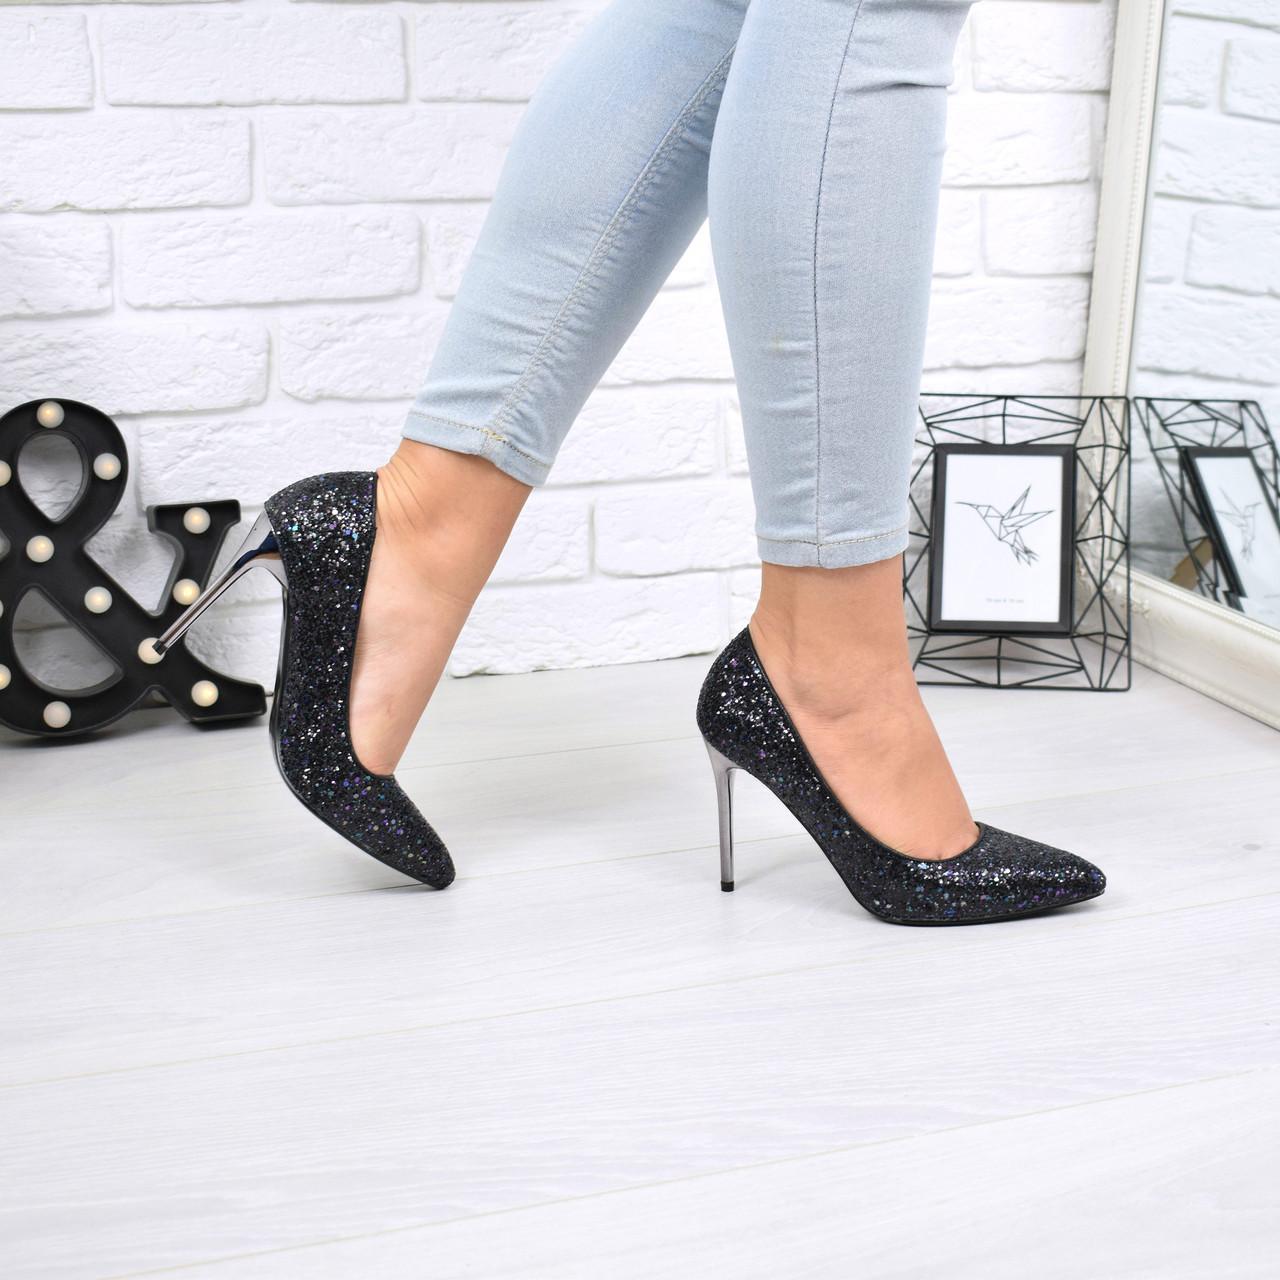 Туфли женские Fashion черные 5241 0e6725a07a1de